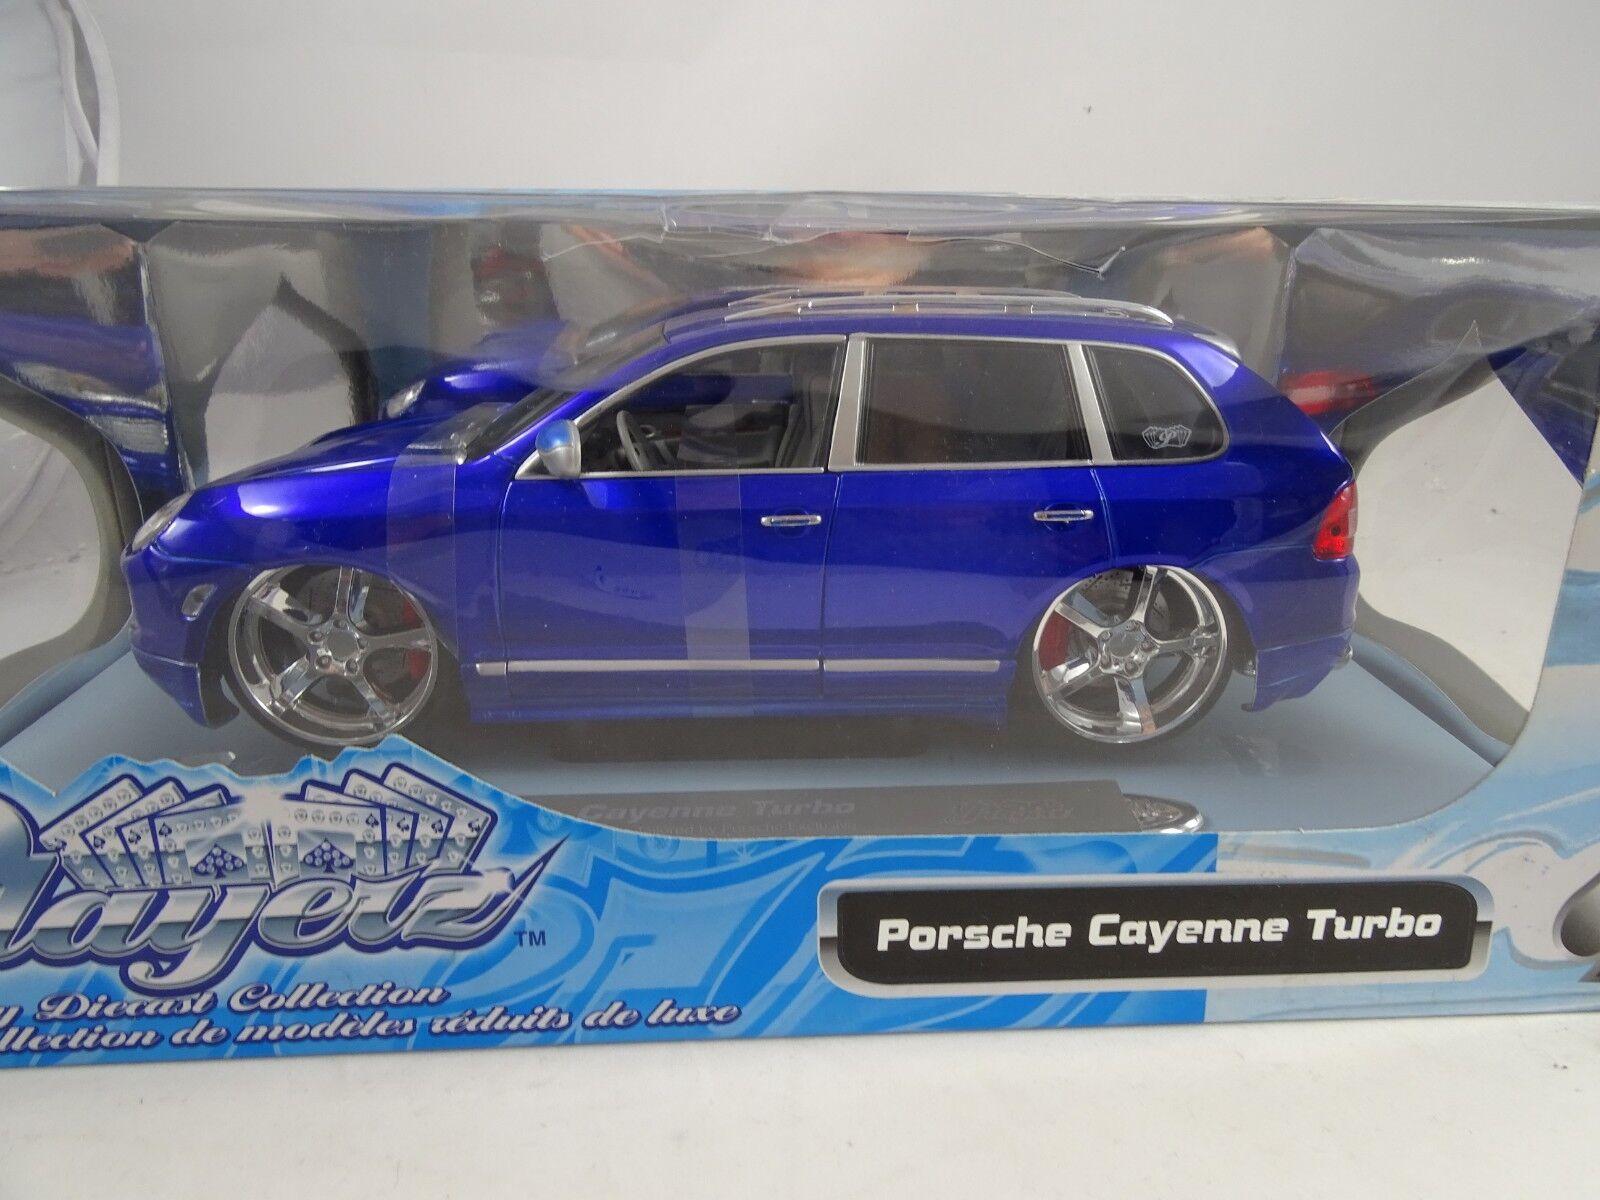 1 18 maisto Playerz porsche cayenne turbo blu-rareza nuevo en el embalaje original